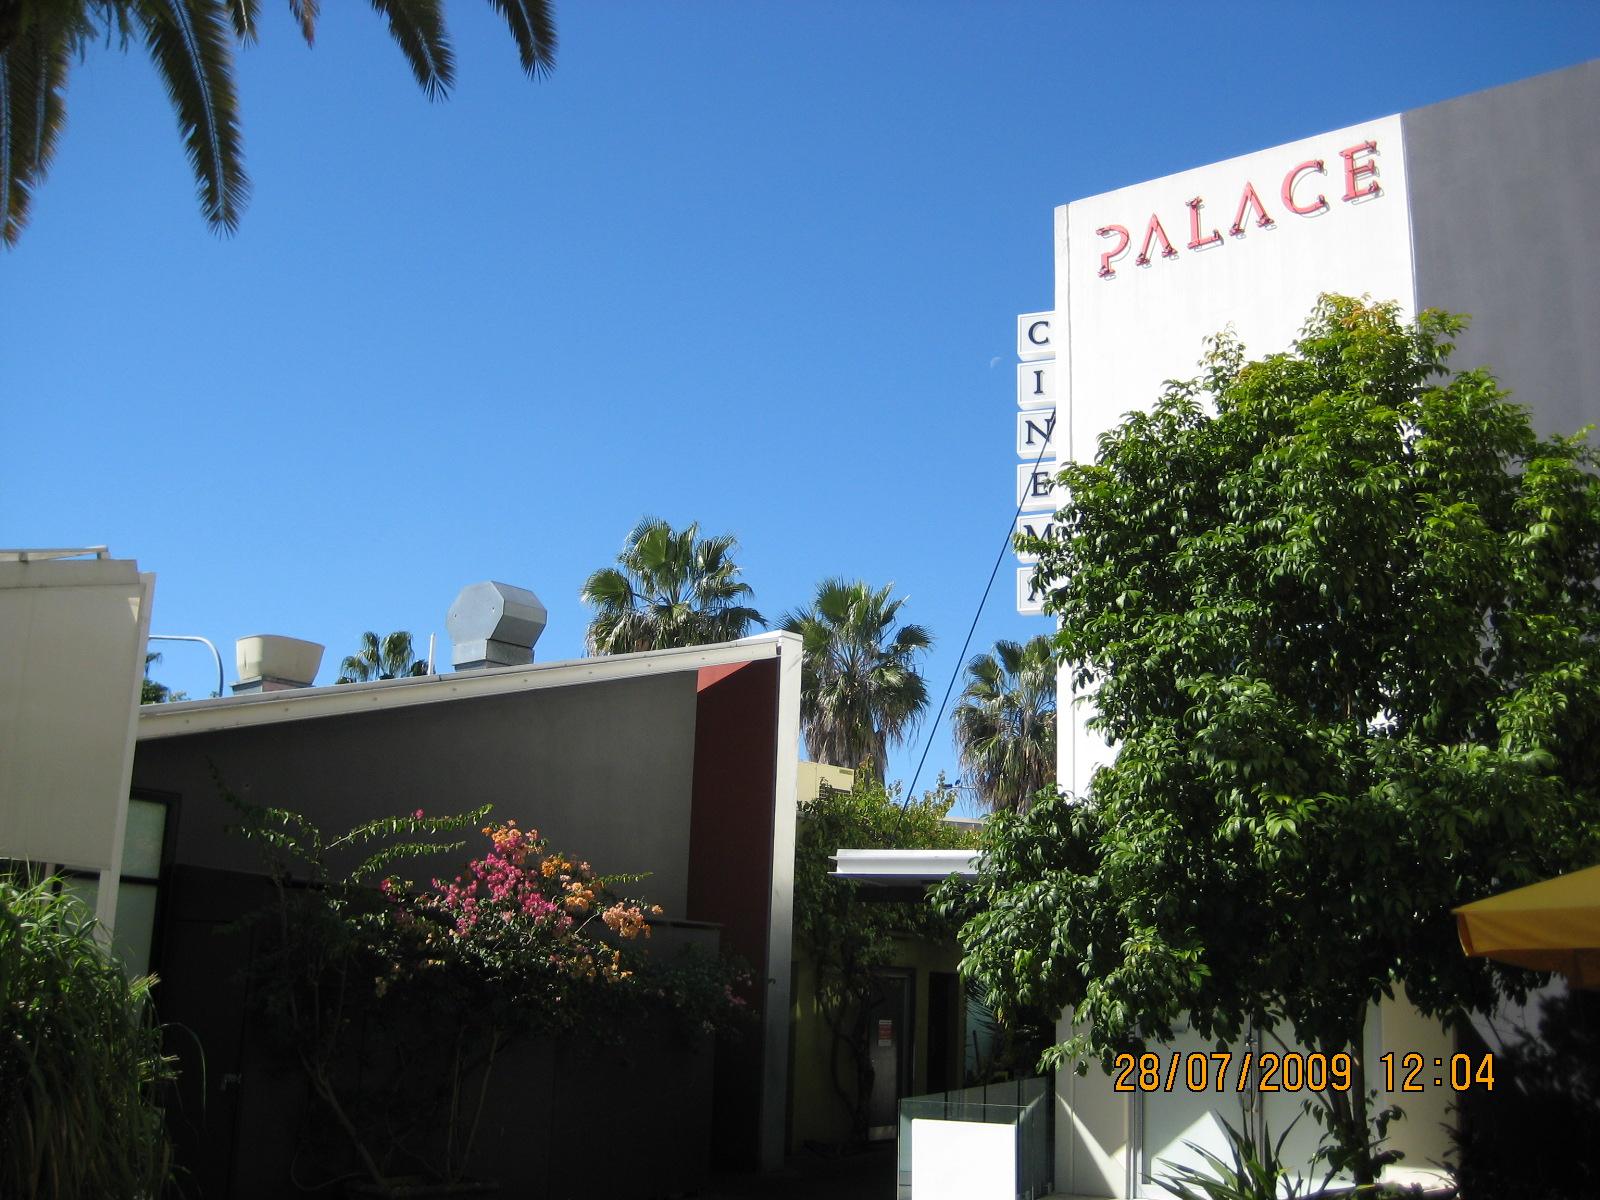 Australia Palace